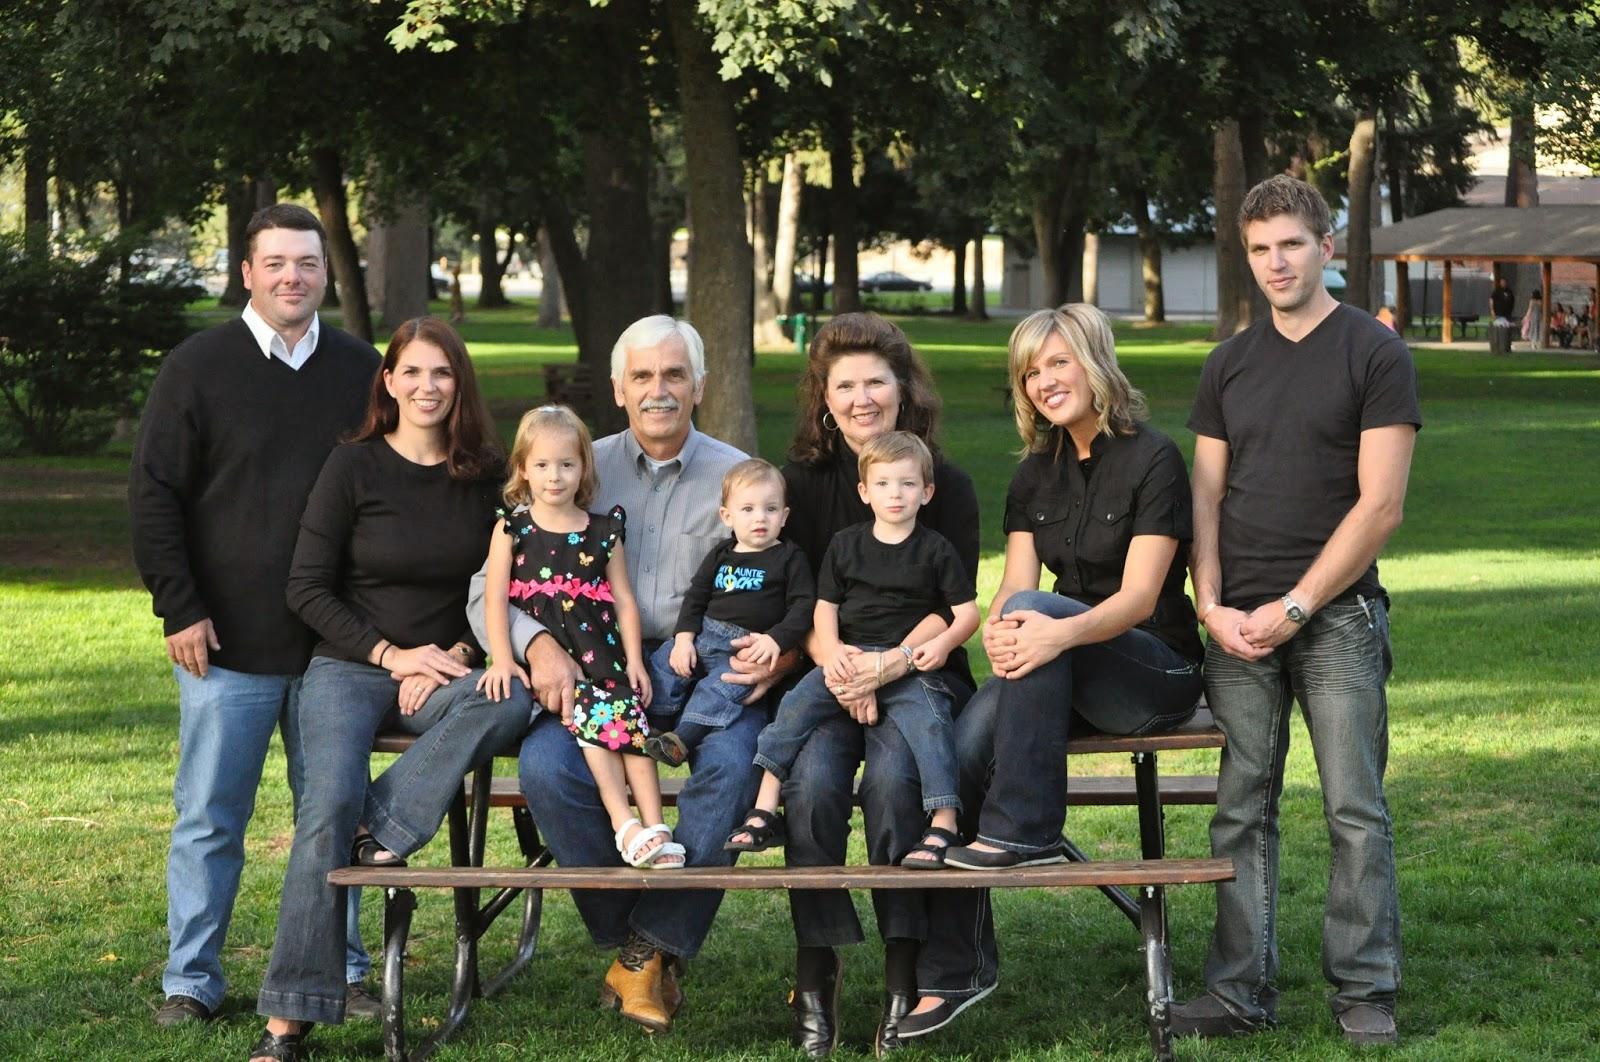 Mendive family